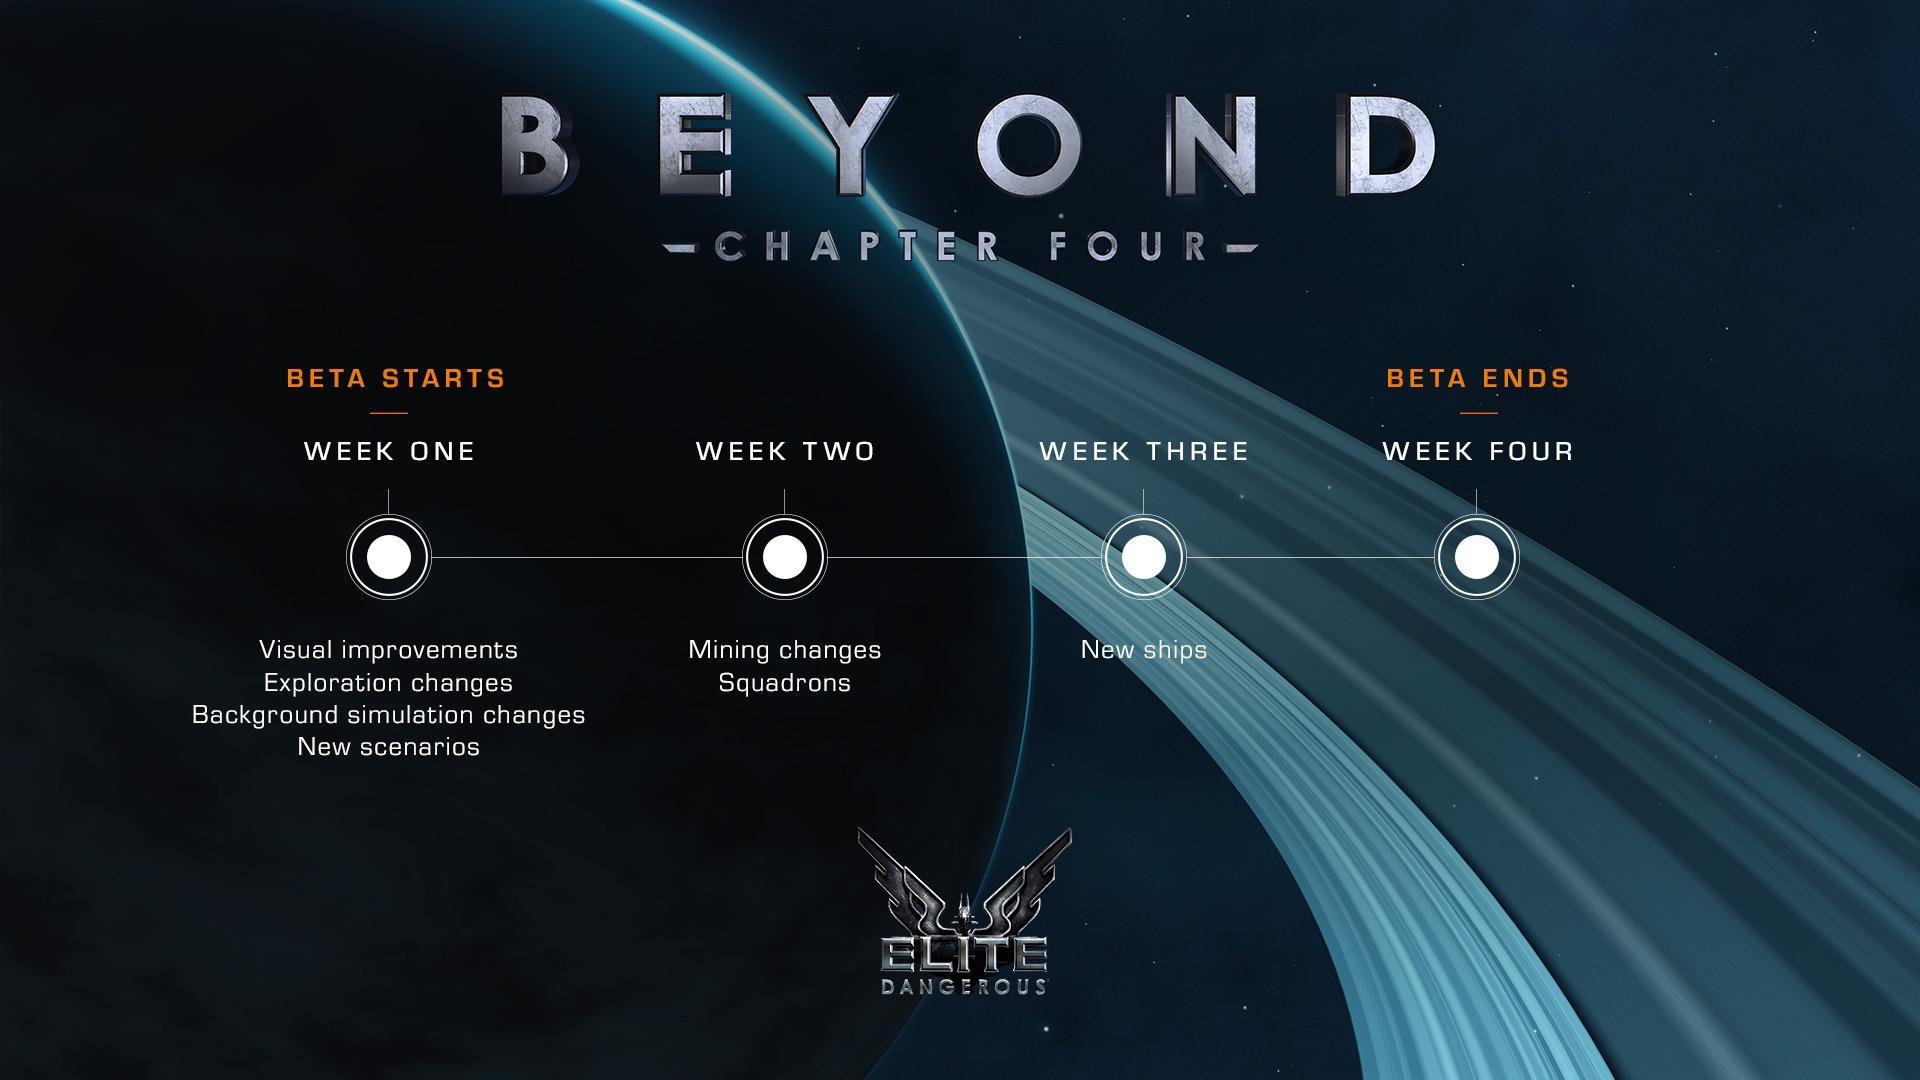 Elite Dangerous: Beyond - Chapter Four Adding New Mining Options